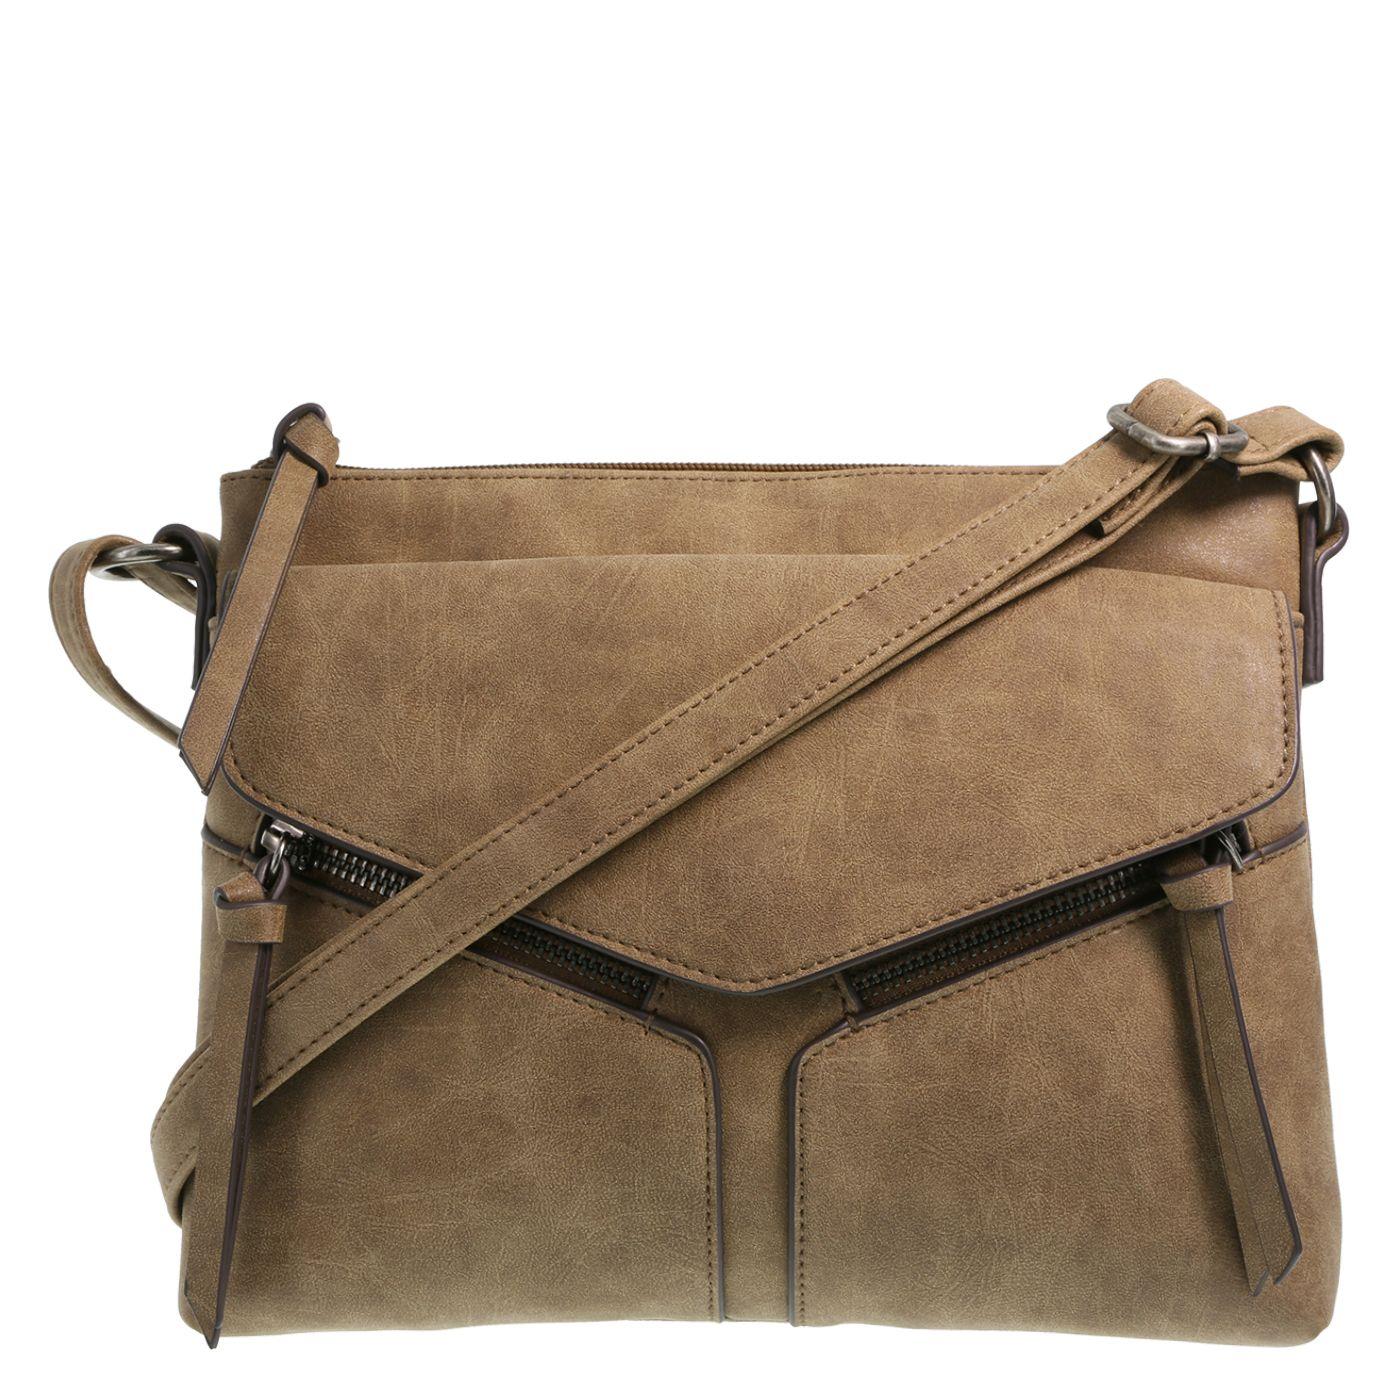 09a7d11af1 American Eagle Holliday Women s Crossbody Bag